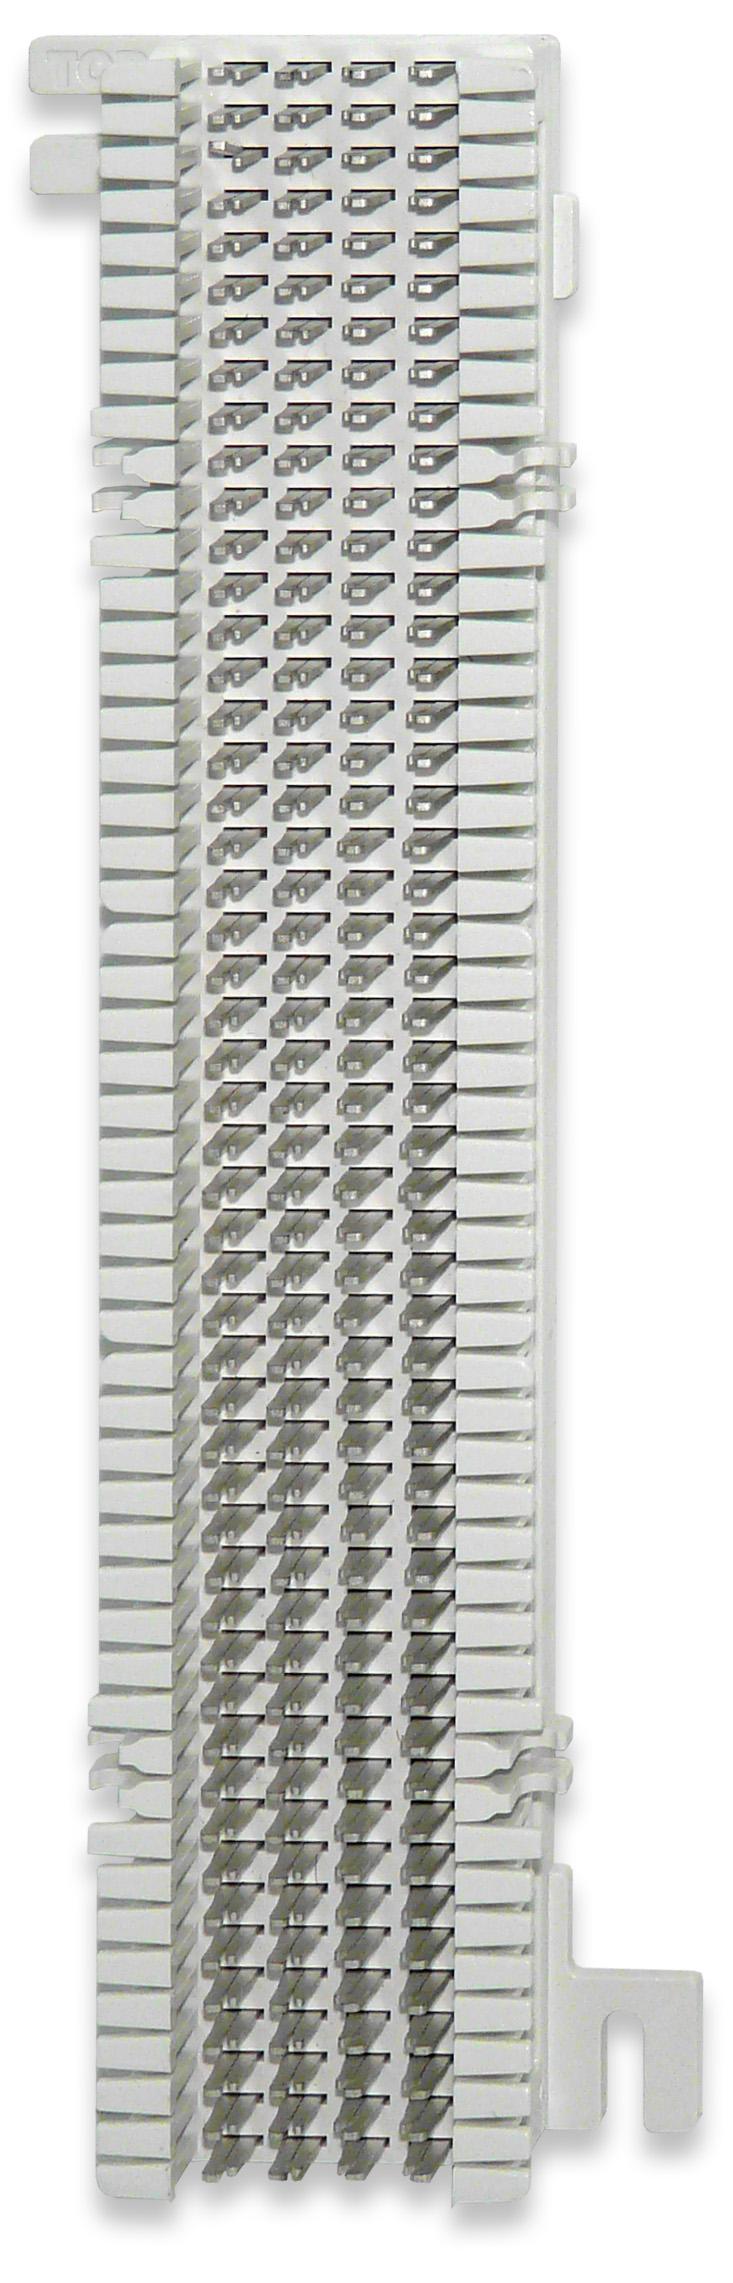 66 Vs 110 Block : block, Web.signamax.com, /productphotos/Connectivity-Solutions/66-110-Products/